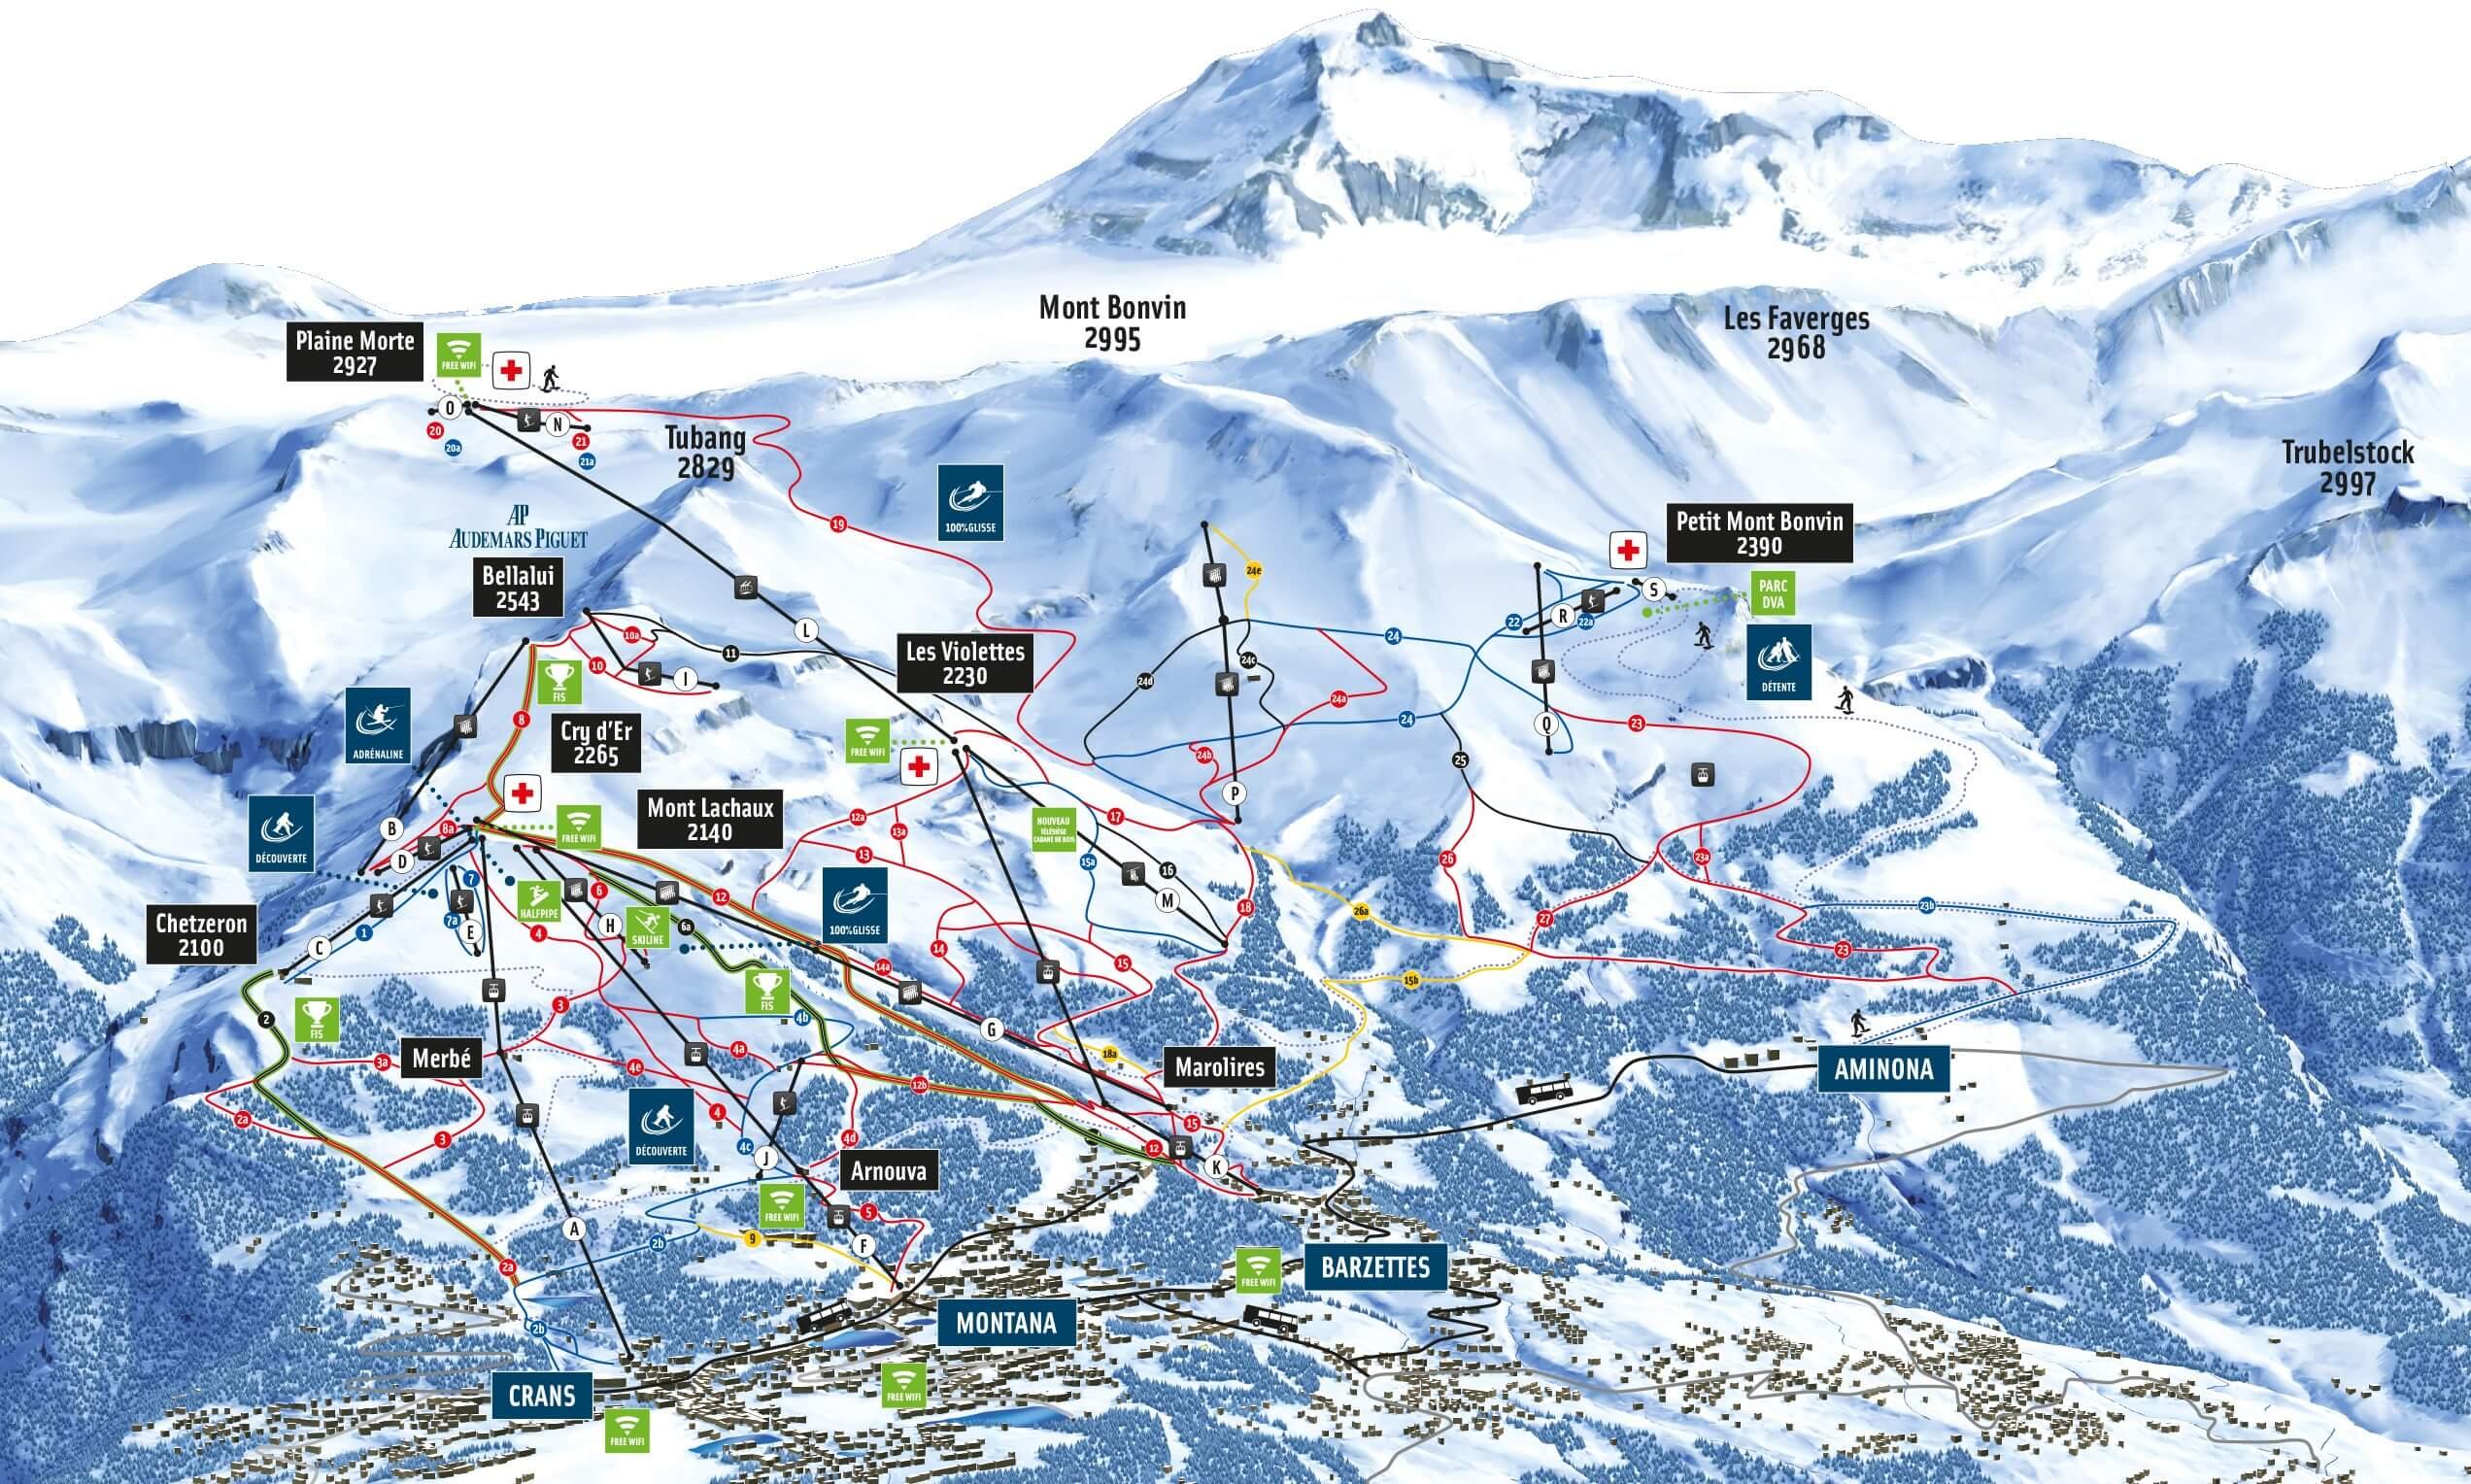 Crans Montana Piste Map 2019-2020